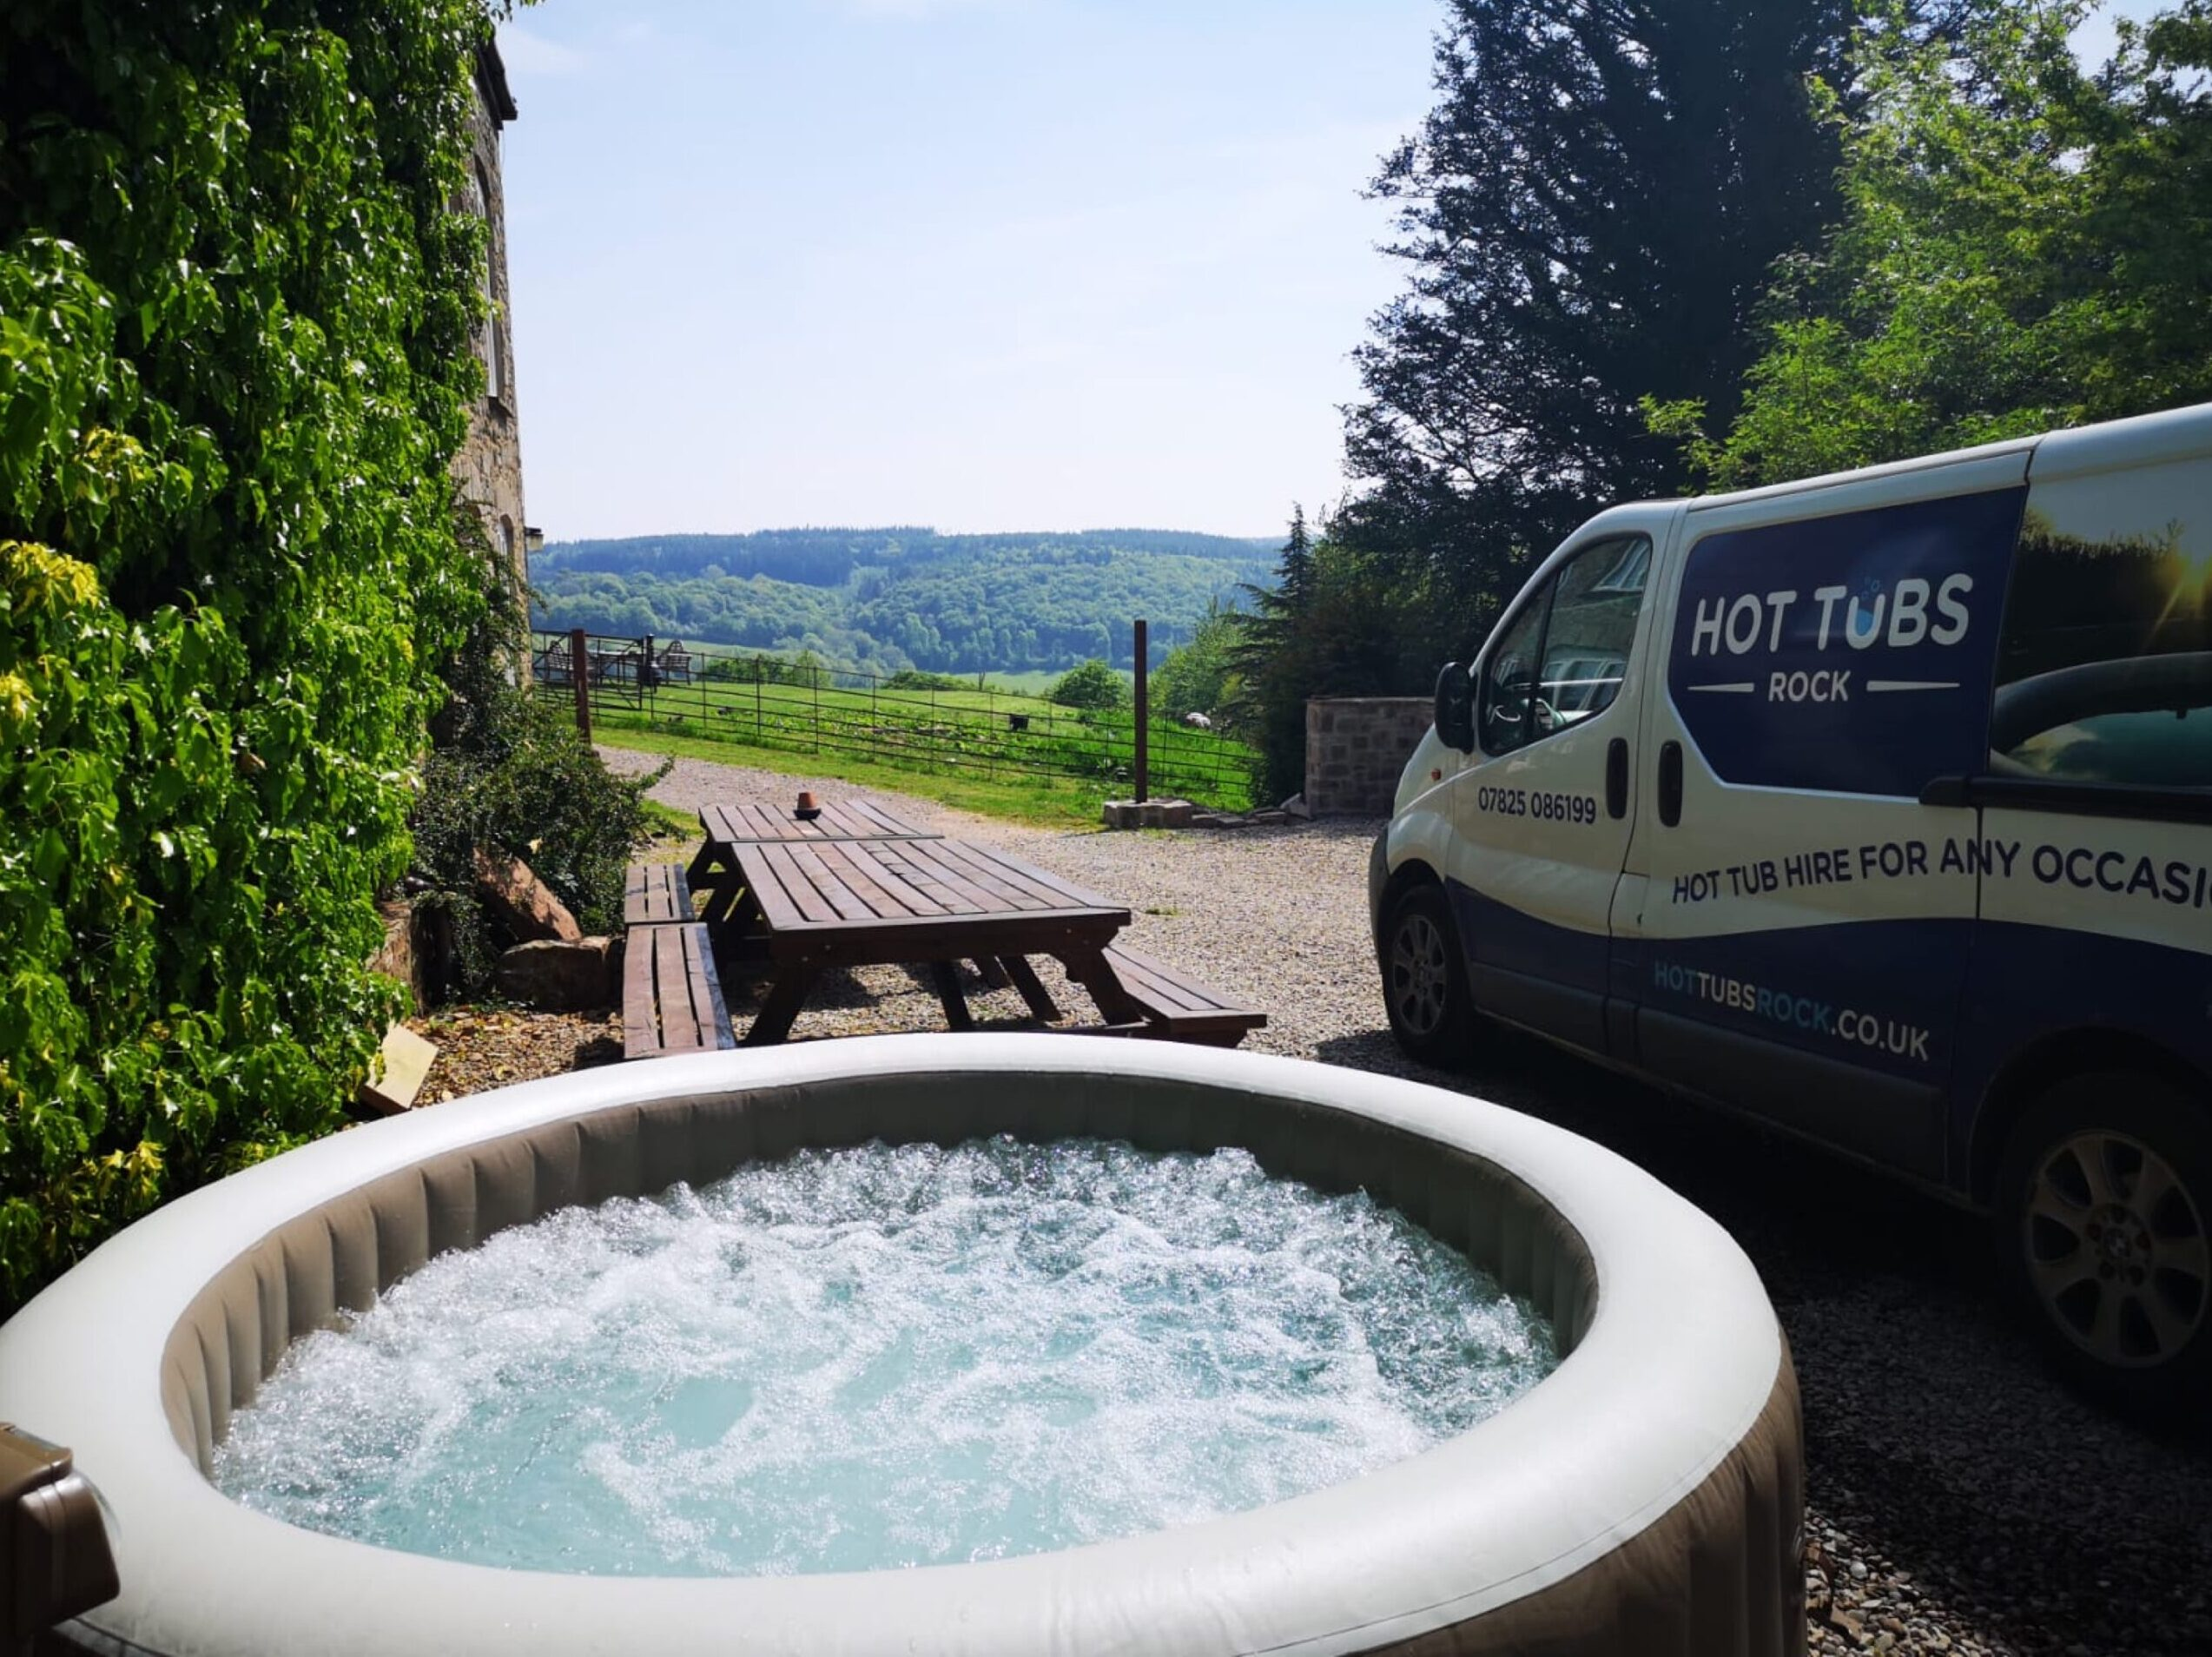 Inflatable hot tub and Hot Tubs Rock van